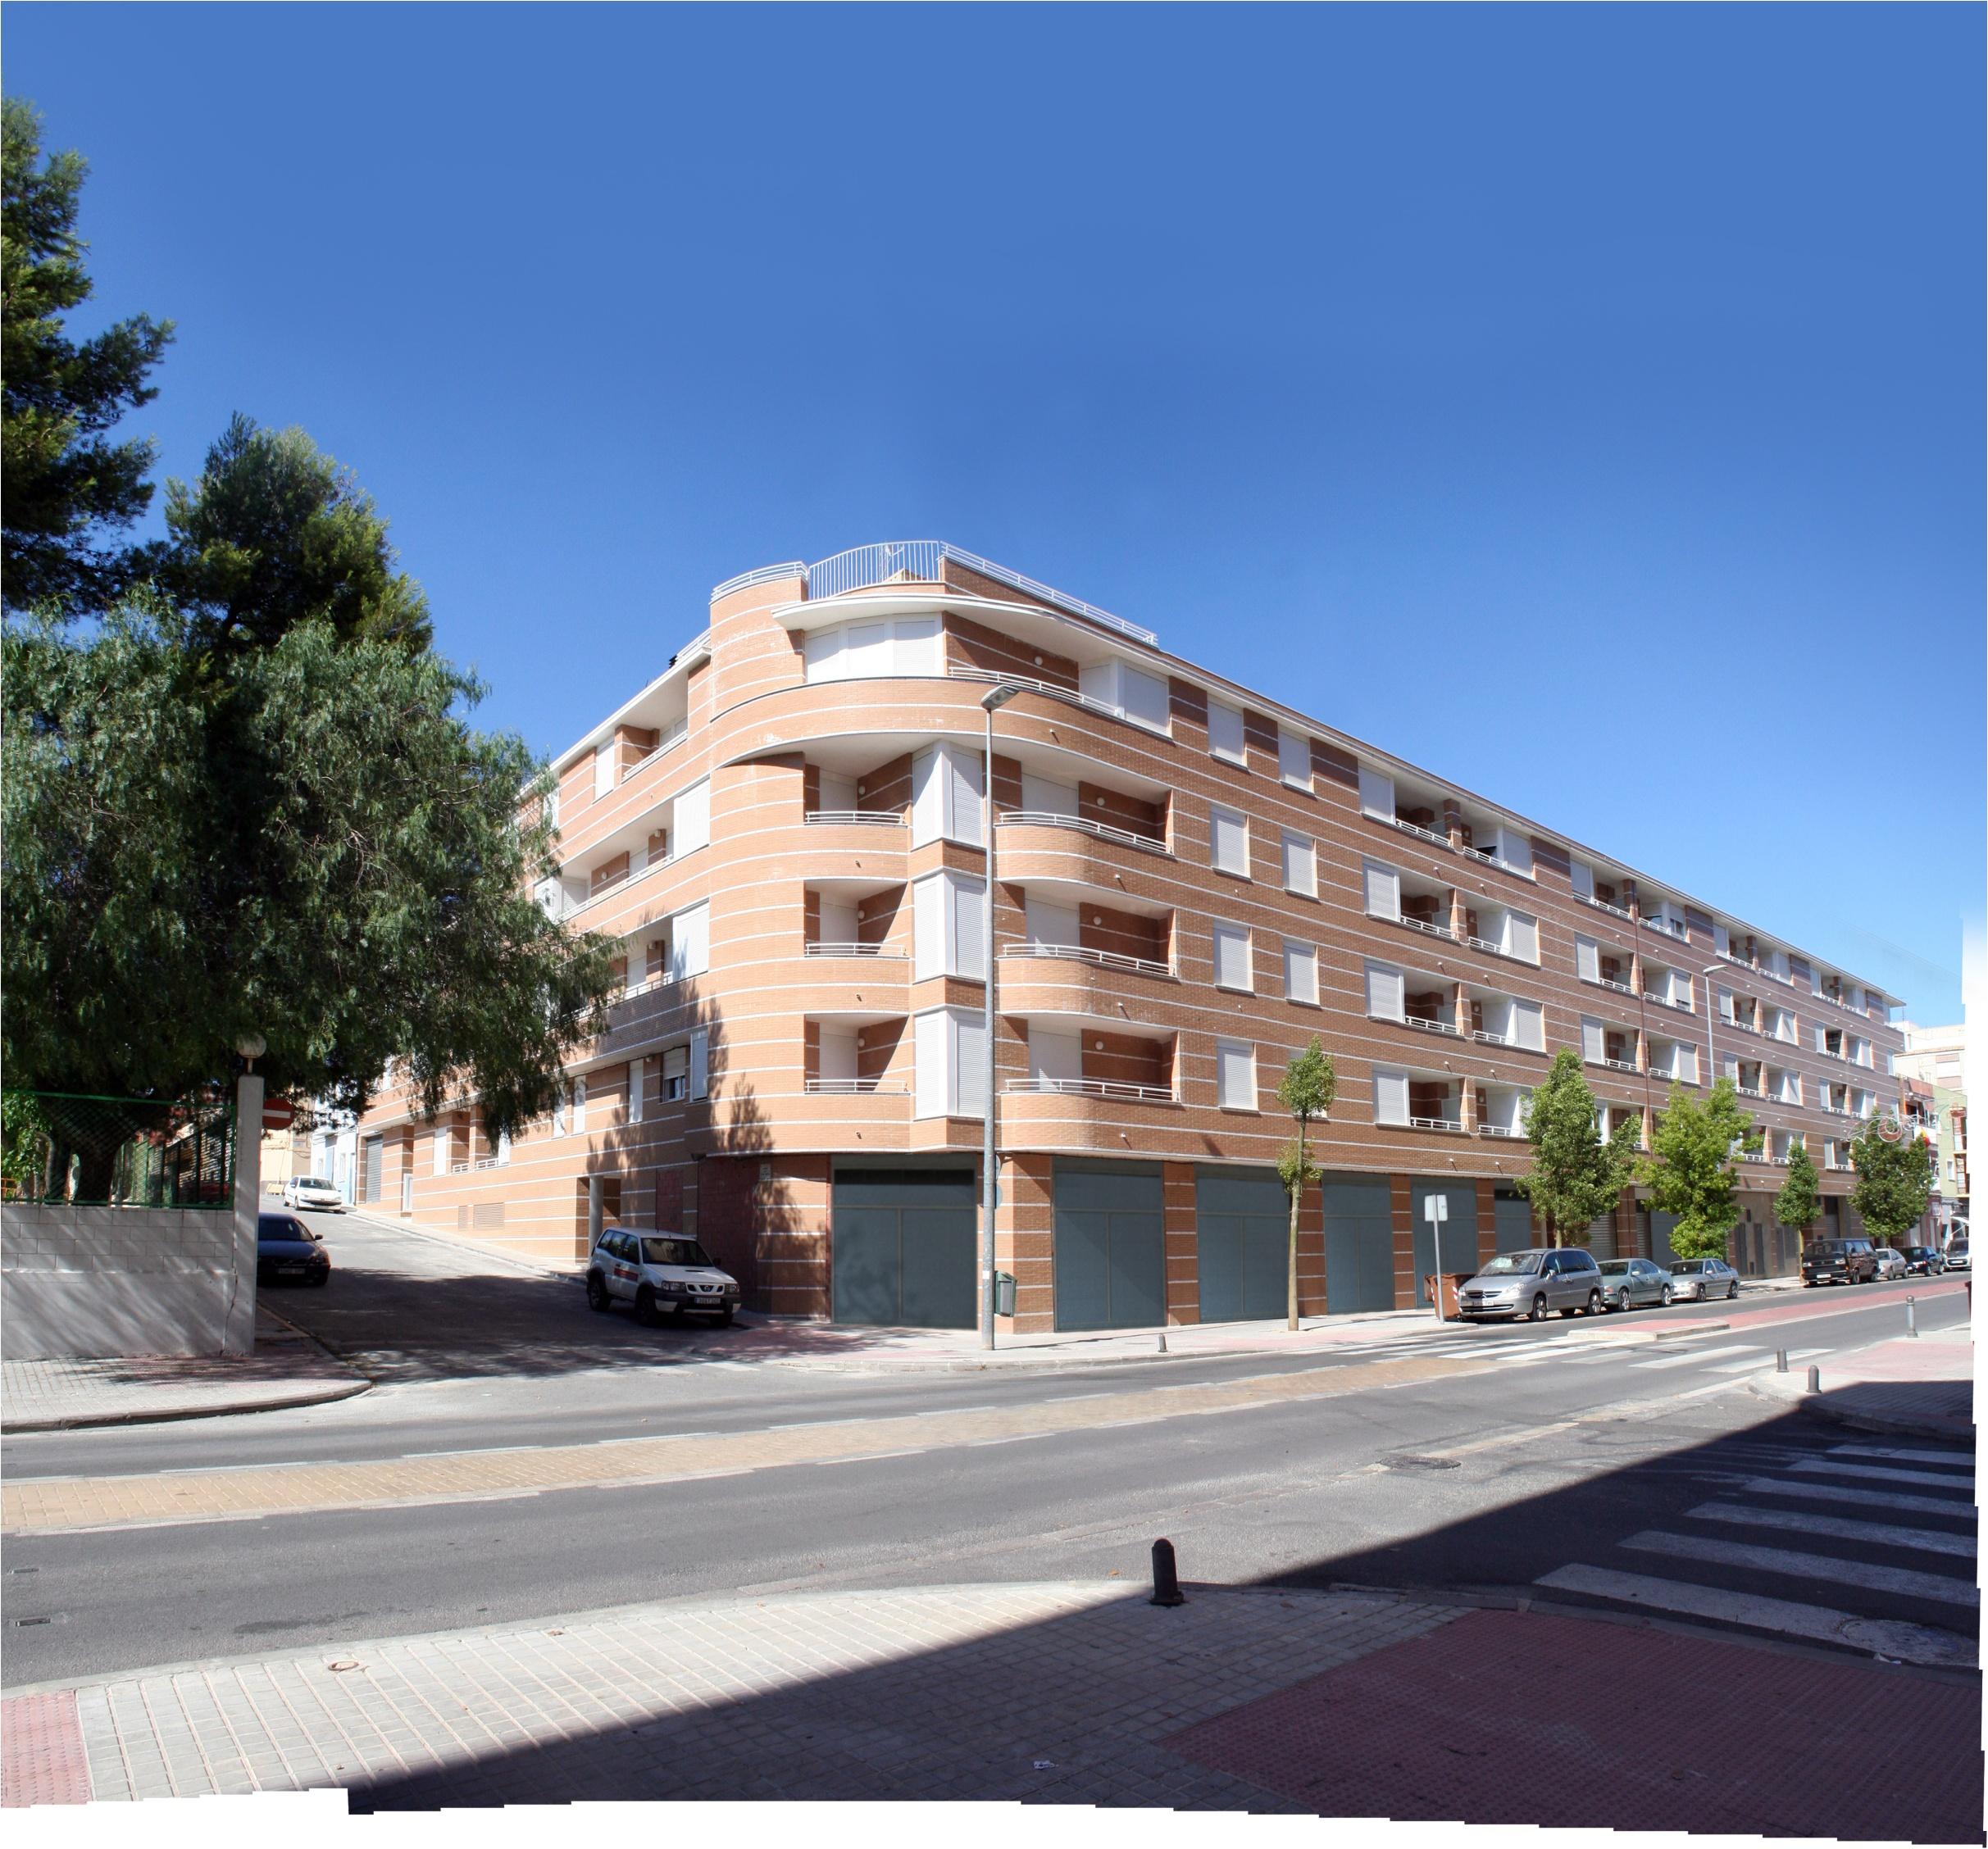 Inmobiliaria carbonell alcoy ontinyent especializada for Pisos alquiler muro de alcoy